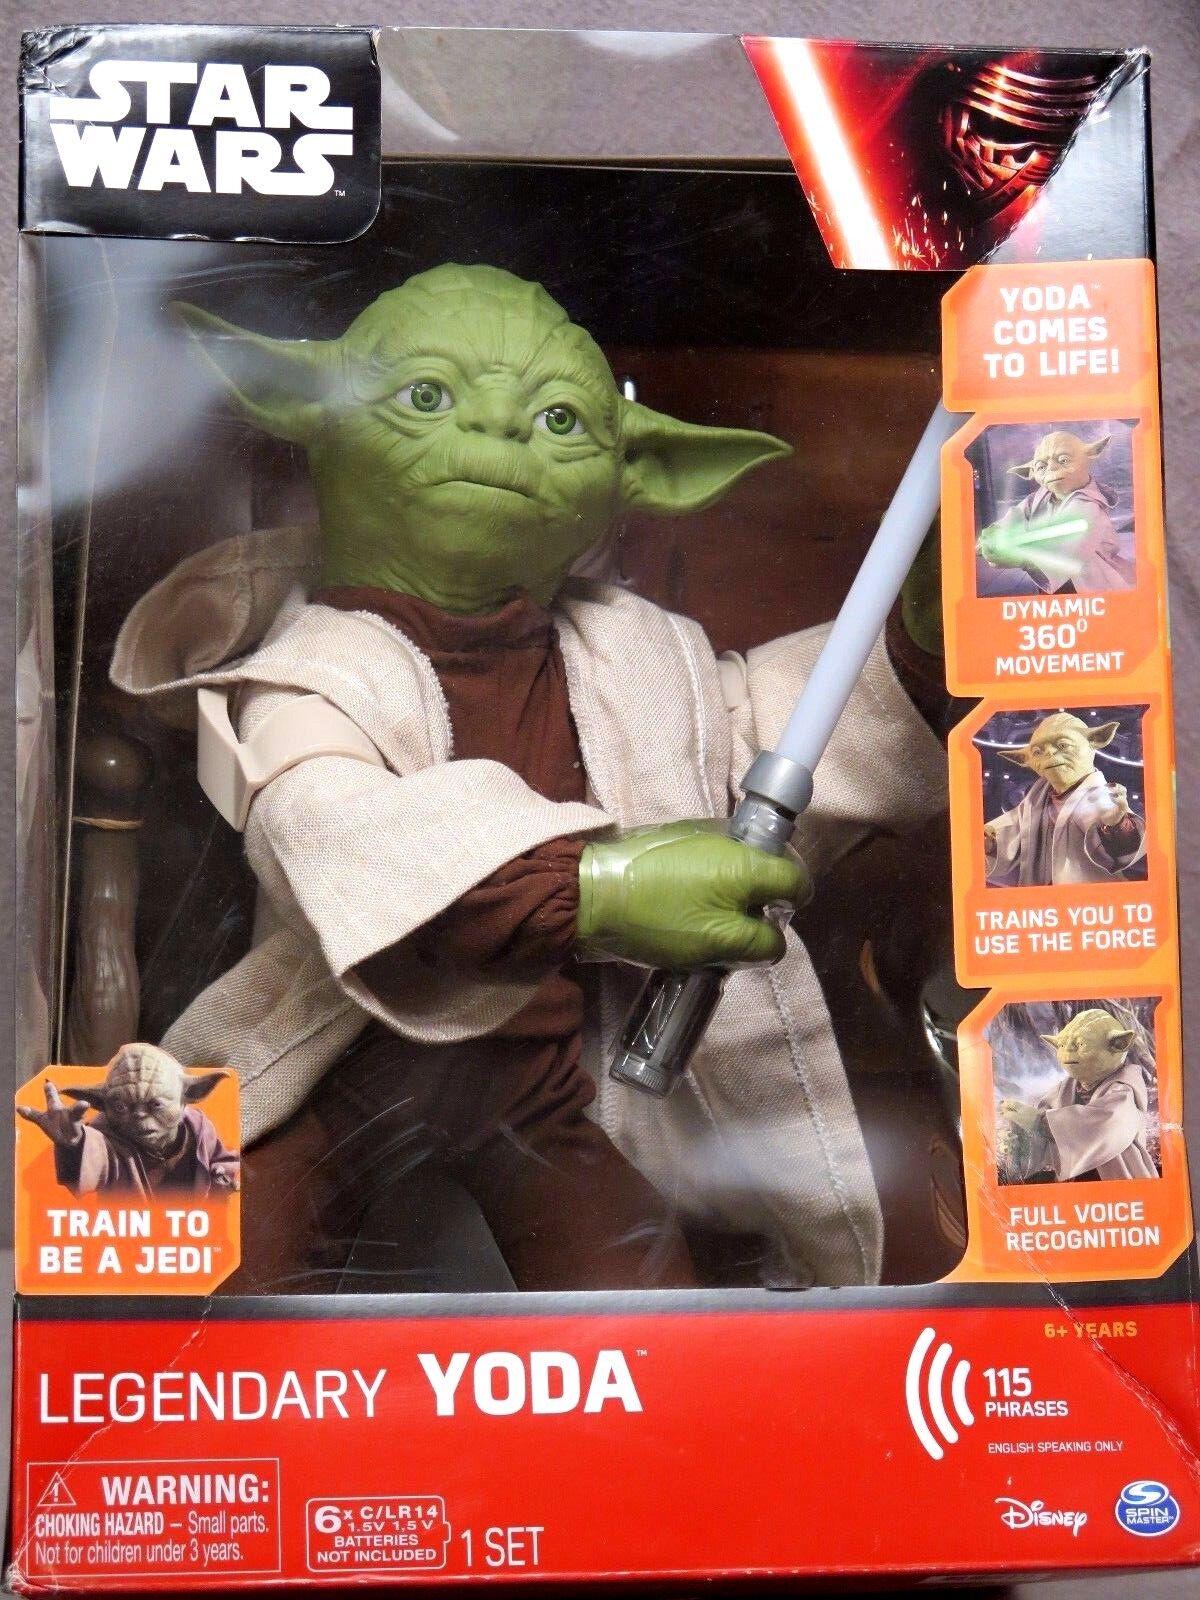 Star Wars Legendary Yoda Train To  Be A Jedi 16  Interactive Figure nouveau IN BOX  À ne pas manquer!